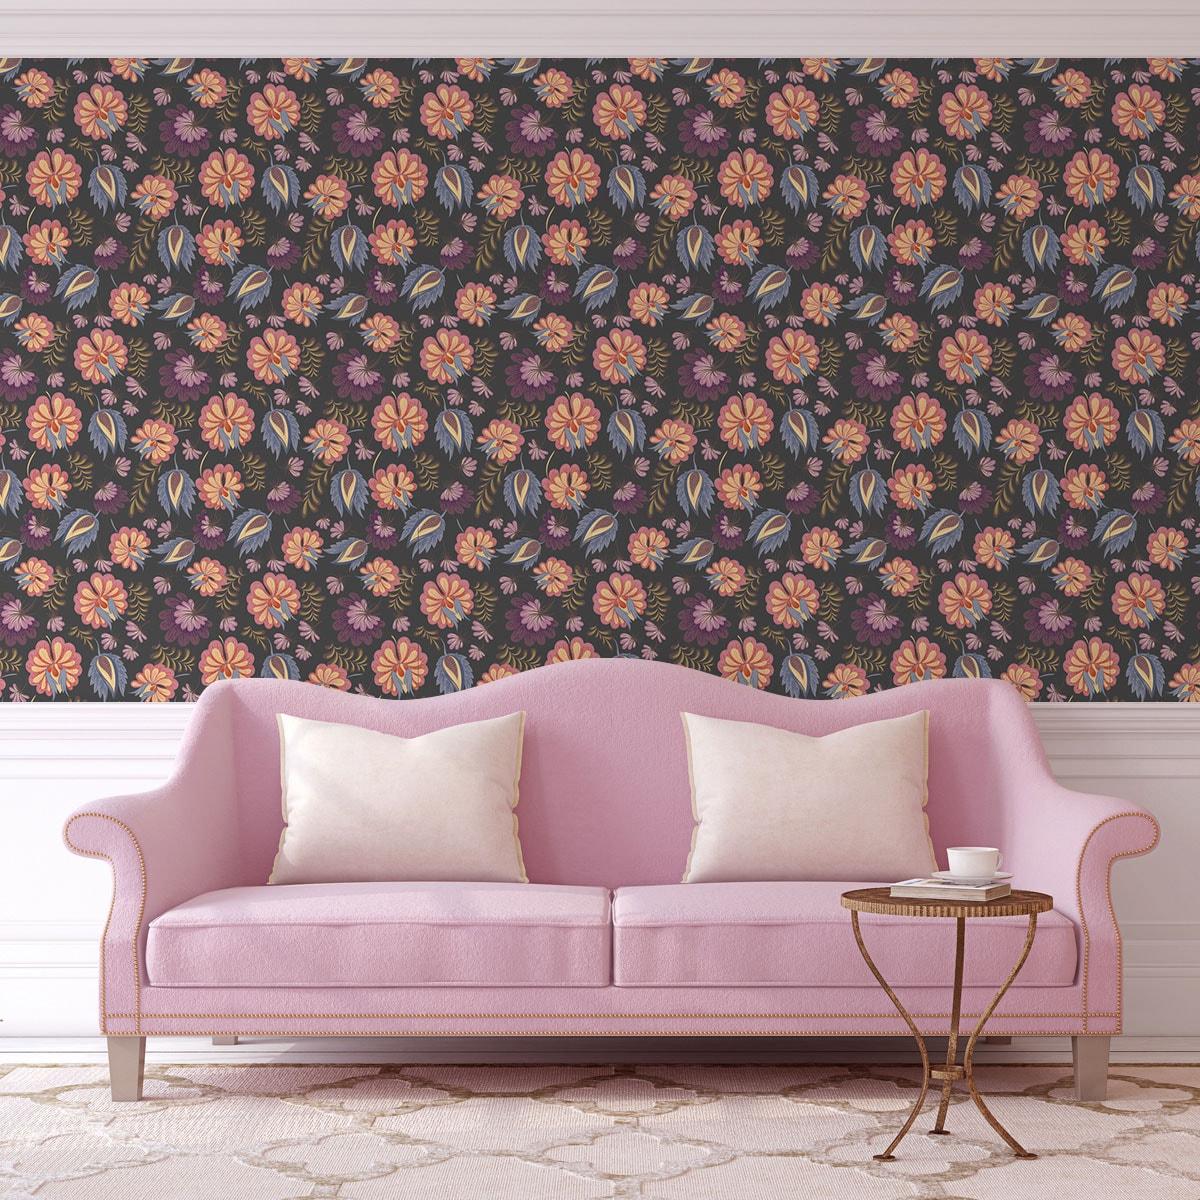 Wandtapete rosa: grau rosa florale Tapete mit großen Blüten angepasst an Little Greene Wandfarbe - Vliestapete Blumen